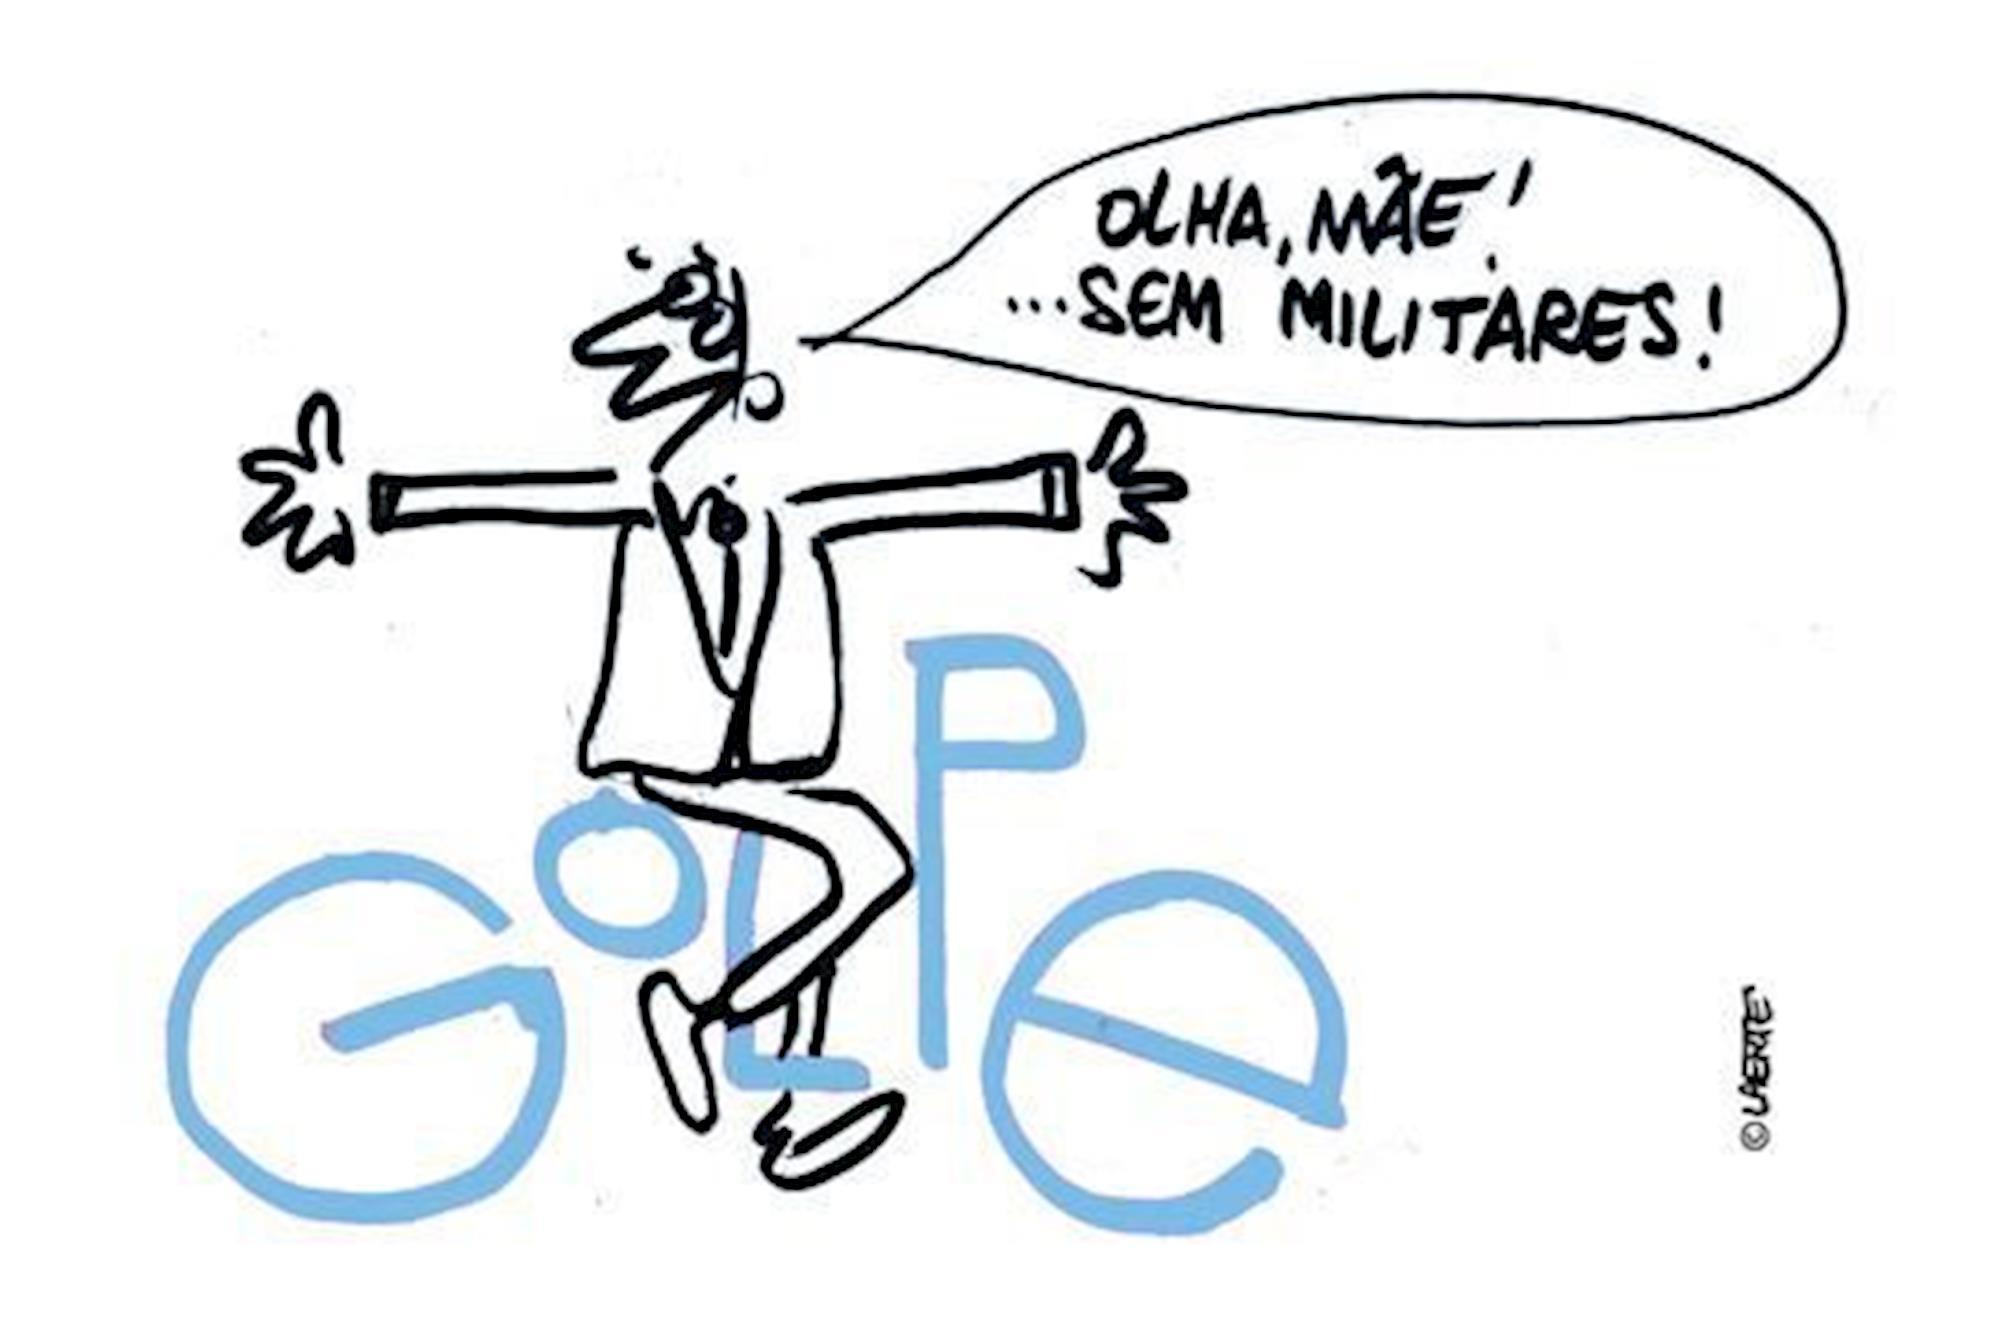 democracia, militares, editorial, 898, Laerte